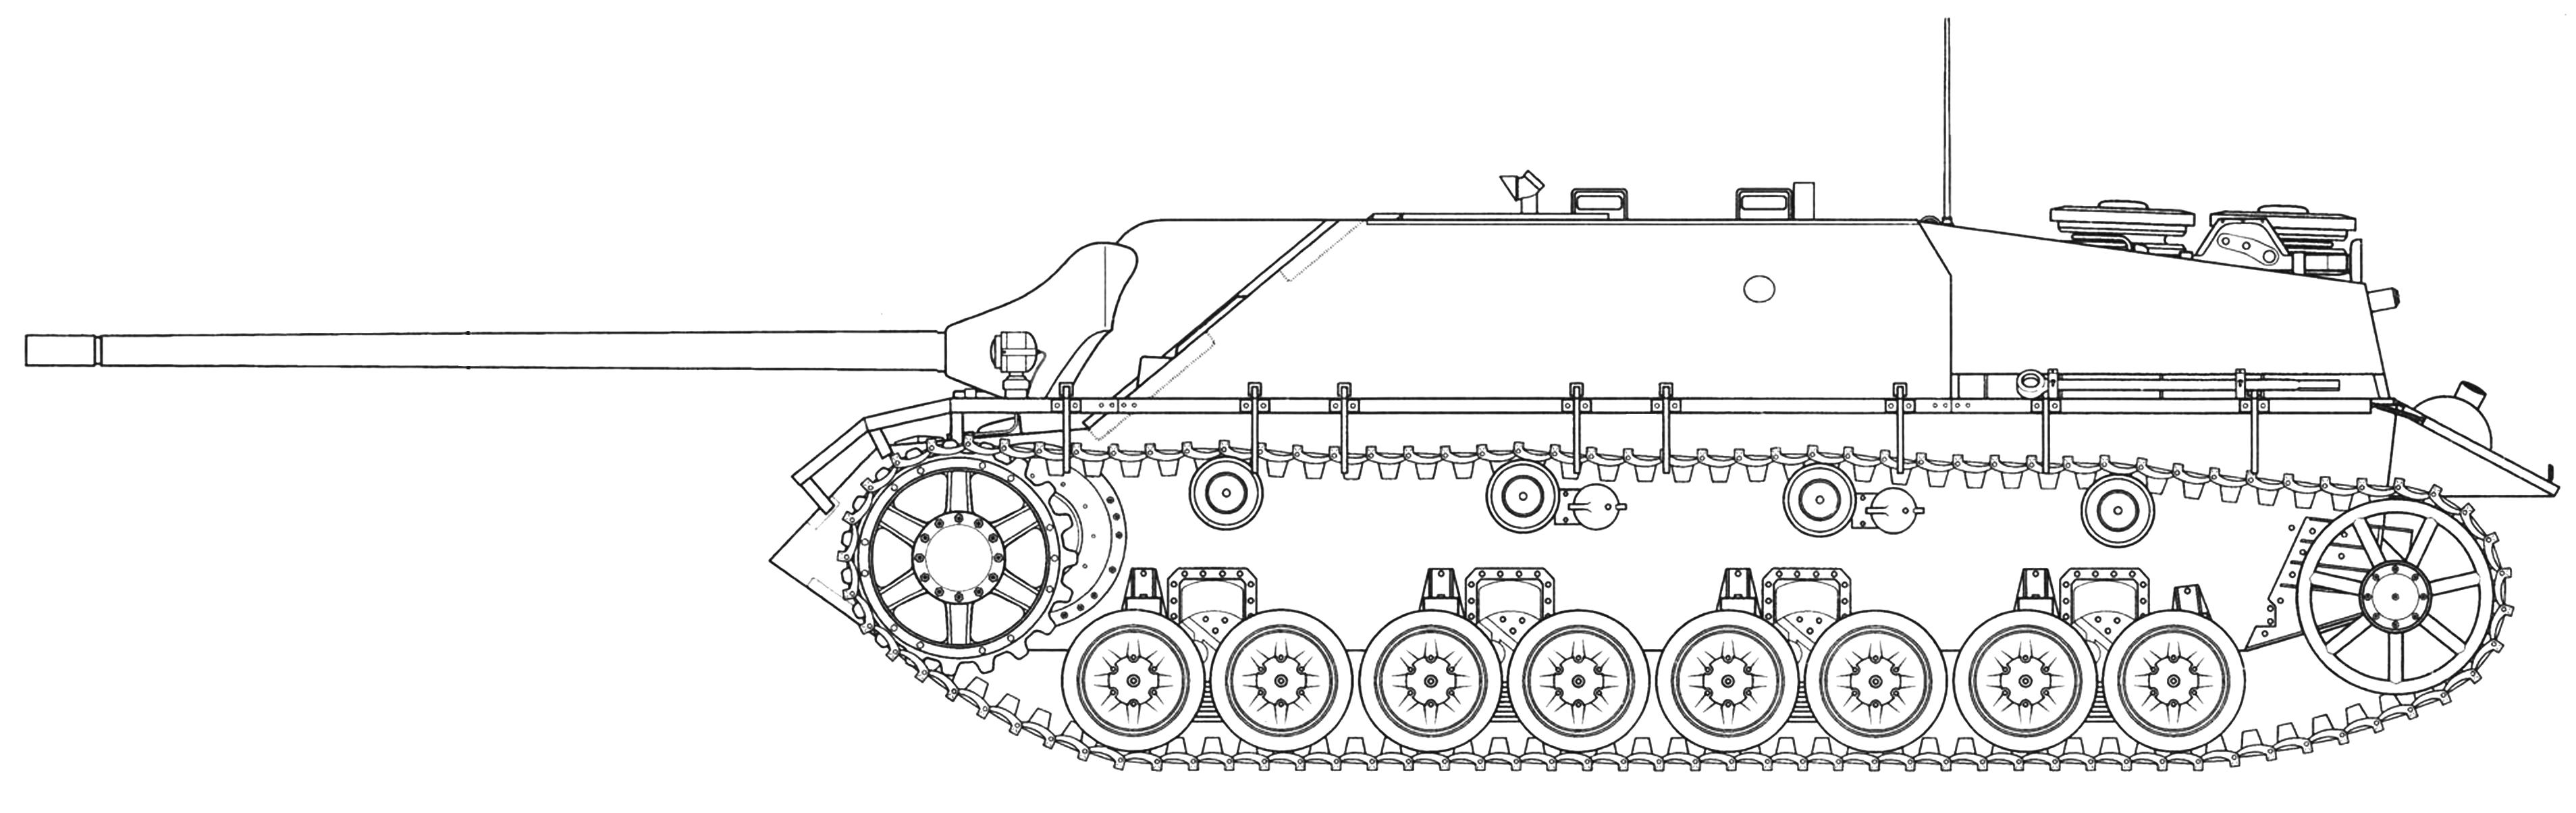 Panzer IV/70 ранних выпусков